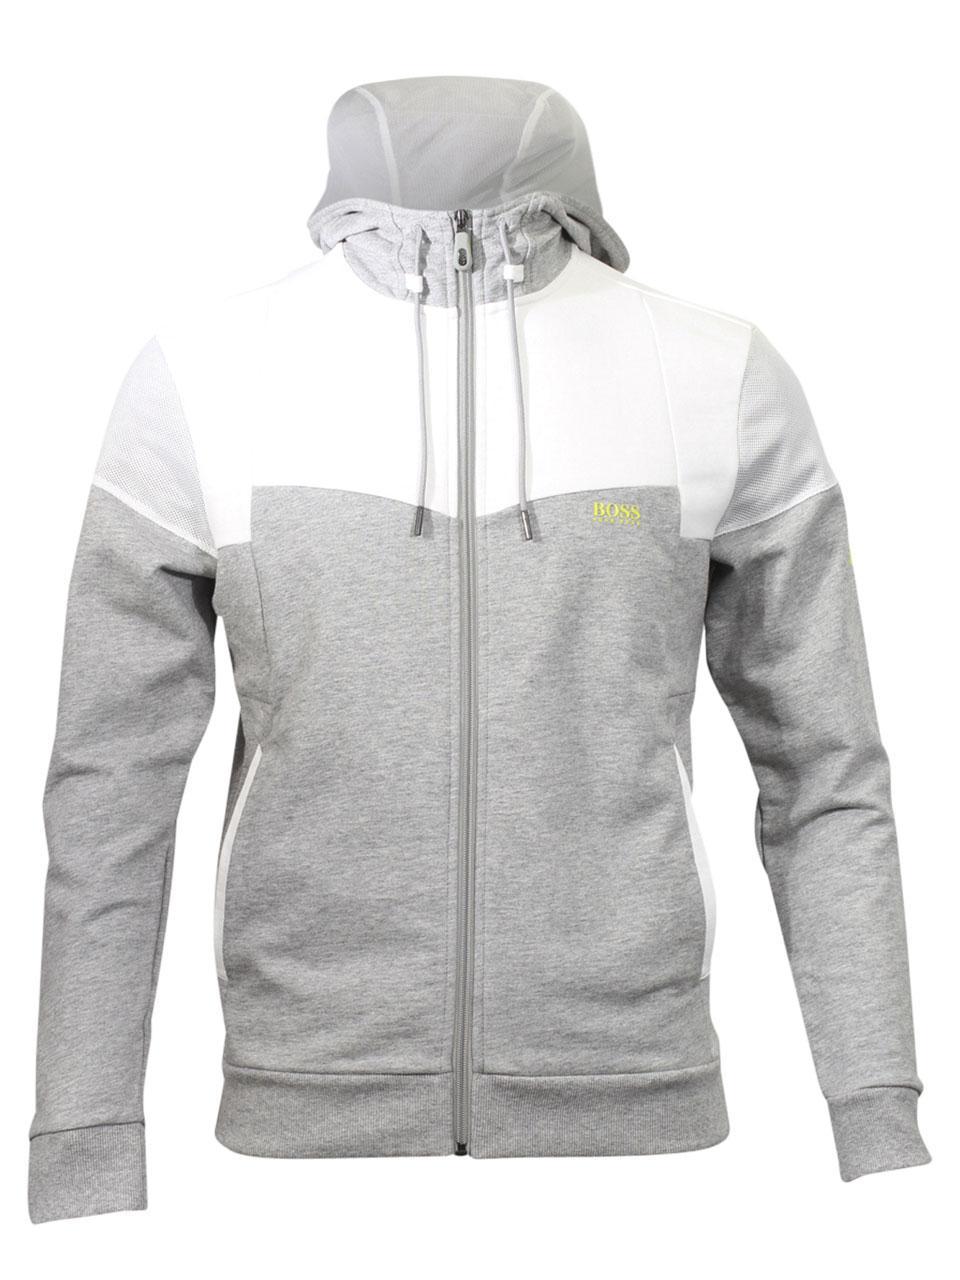 48f74a54f Hugo Boss Men's Saggy-1 Hooded Cotton Sweatshirt Zip-Jacket